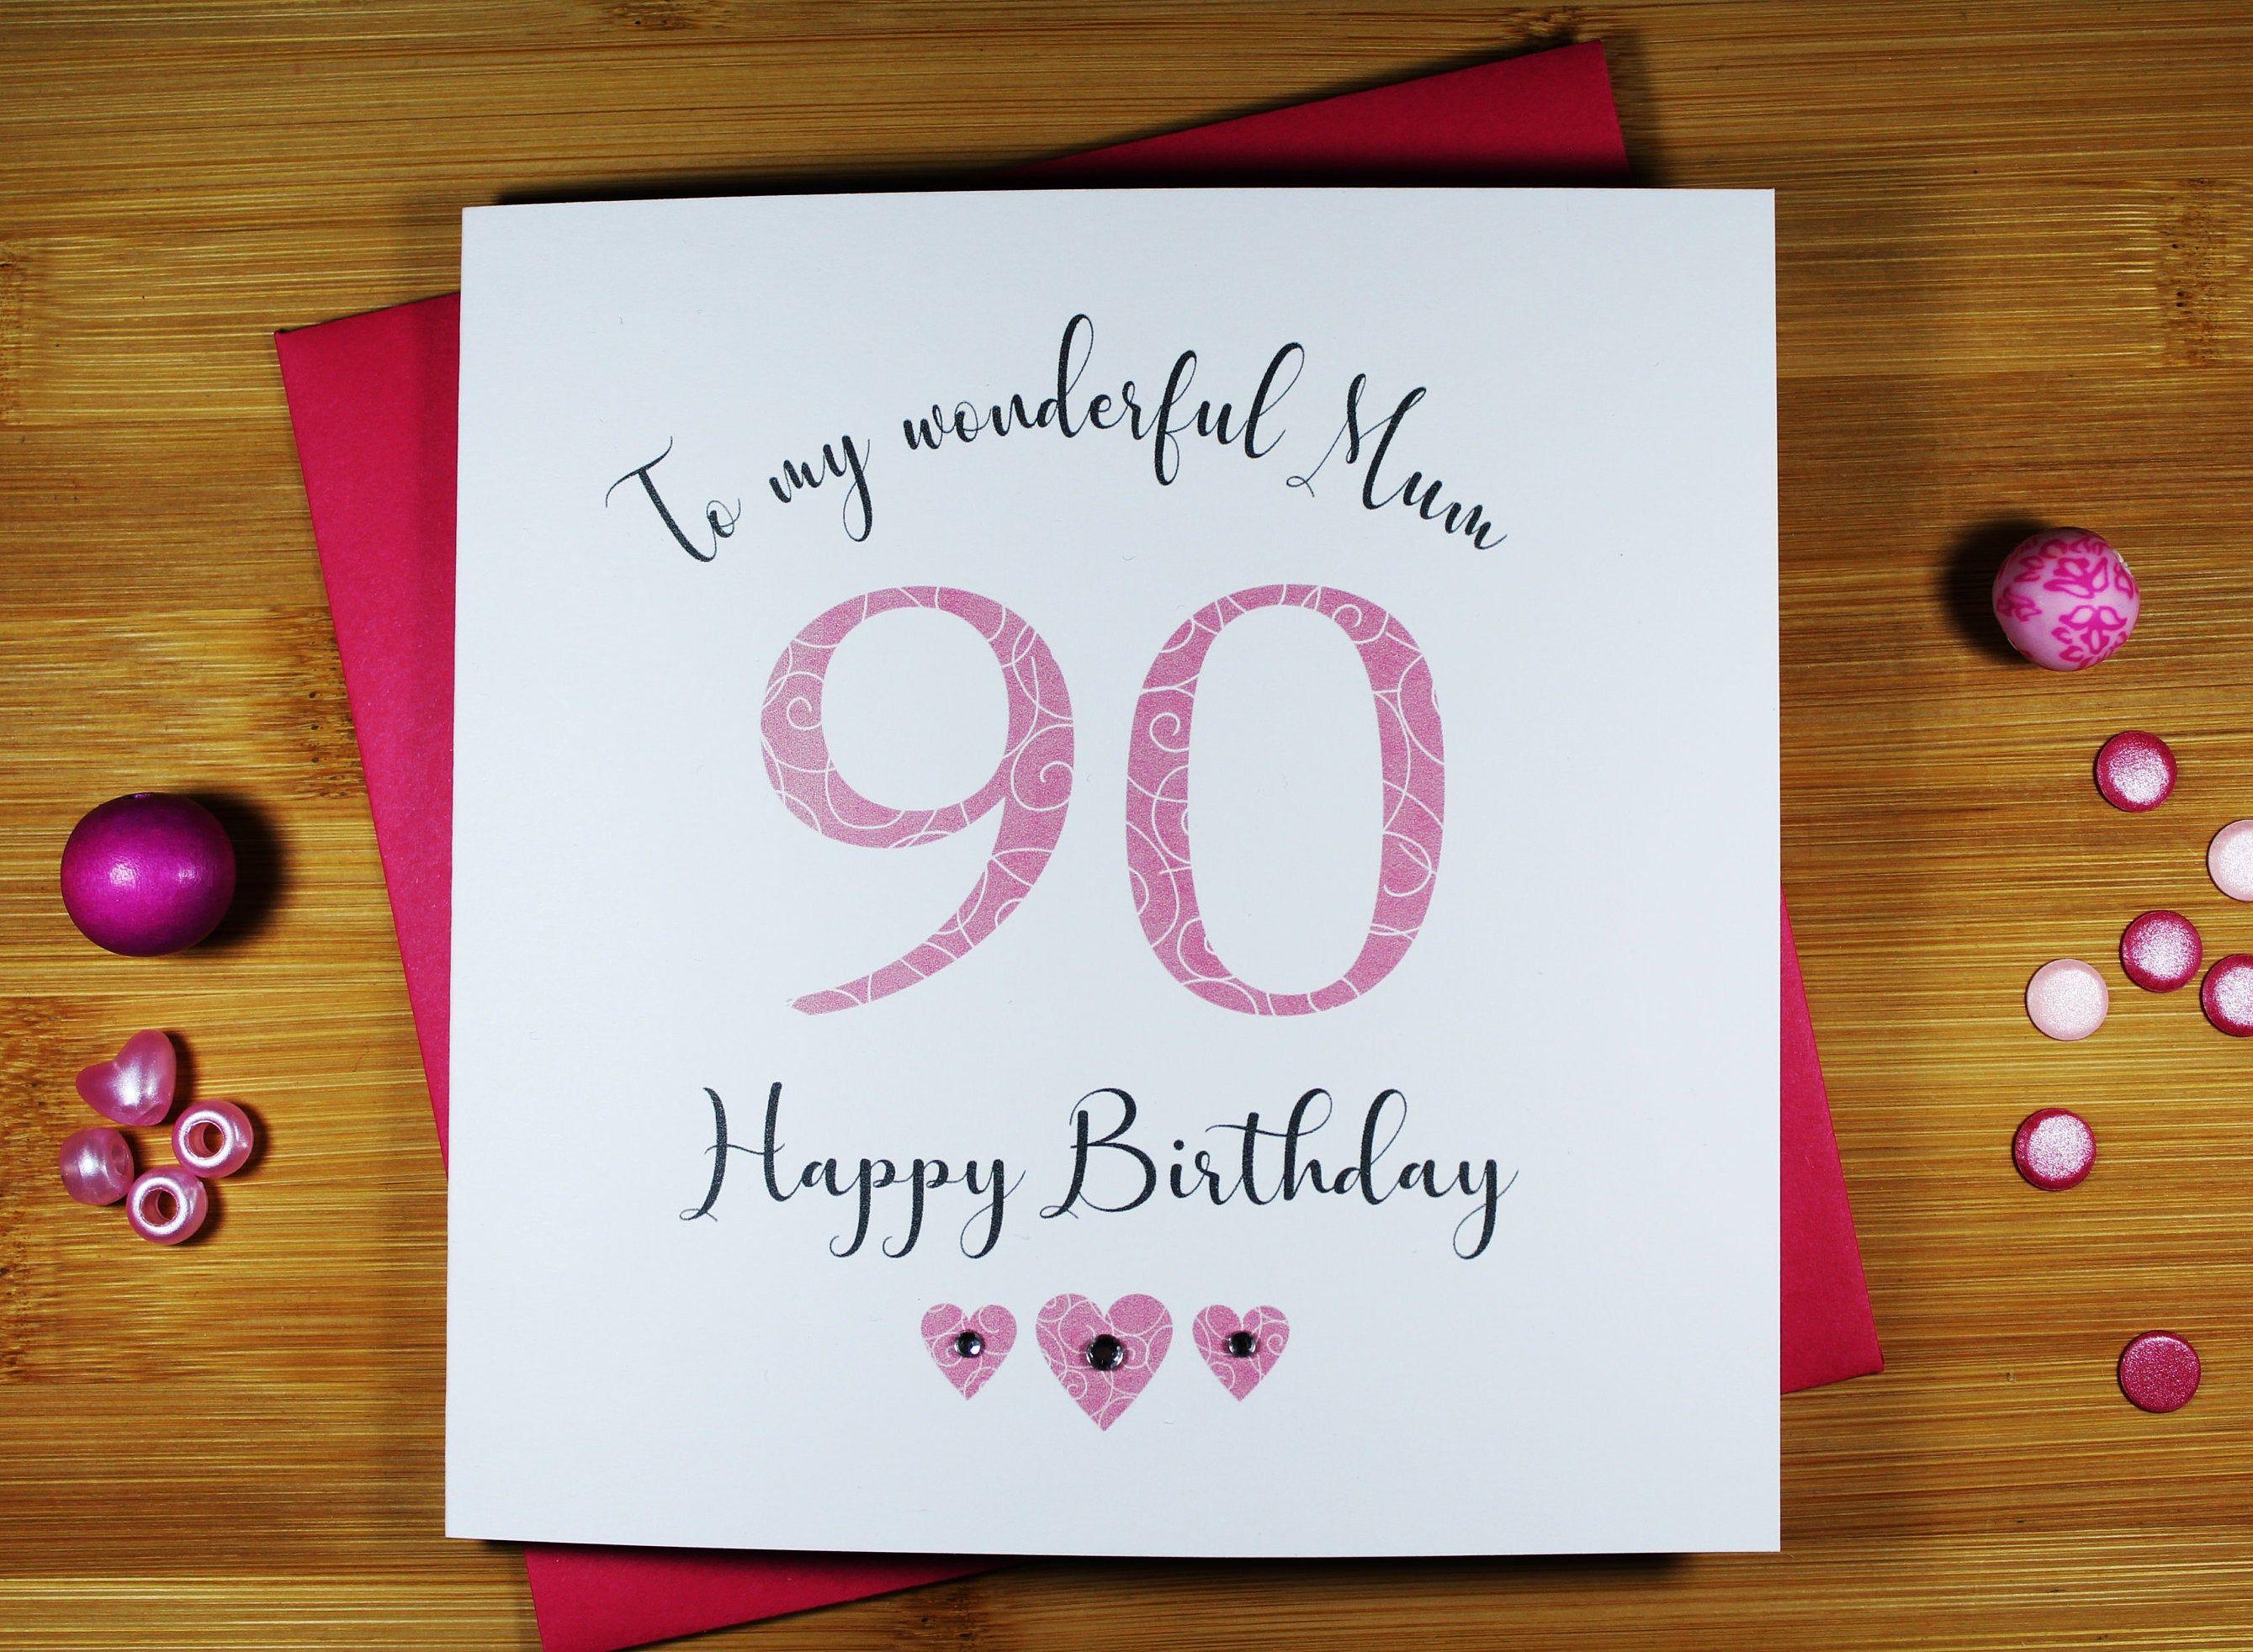 90th Birthday Card Mum Gran Nan Sister Wife Cousin Friend Etsy 90th Birthday Cards Birthday Cards Happy Birthday Cards